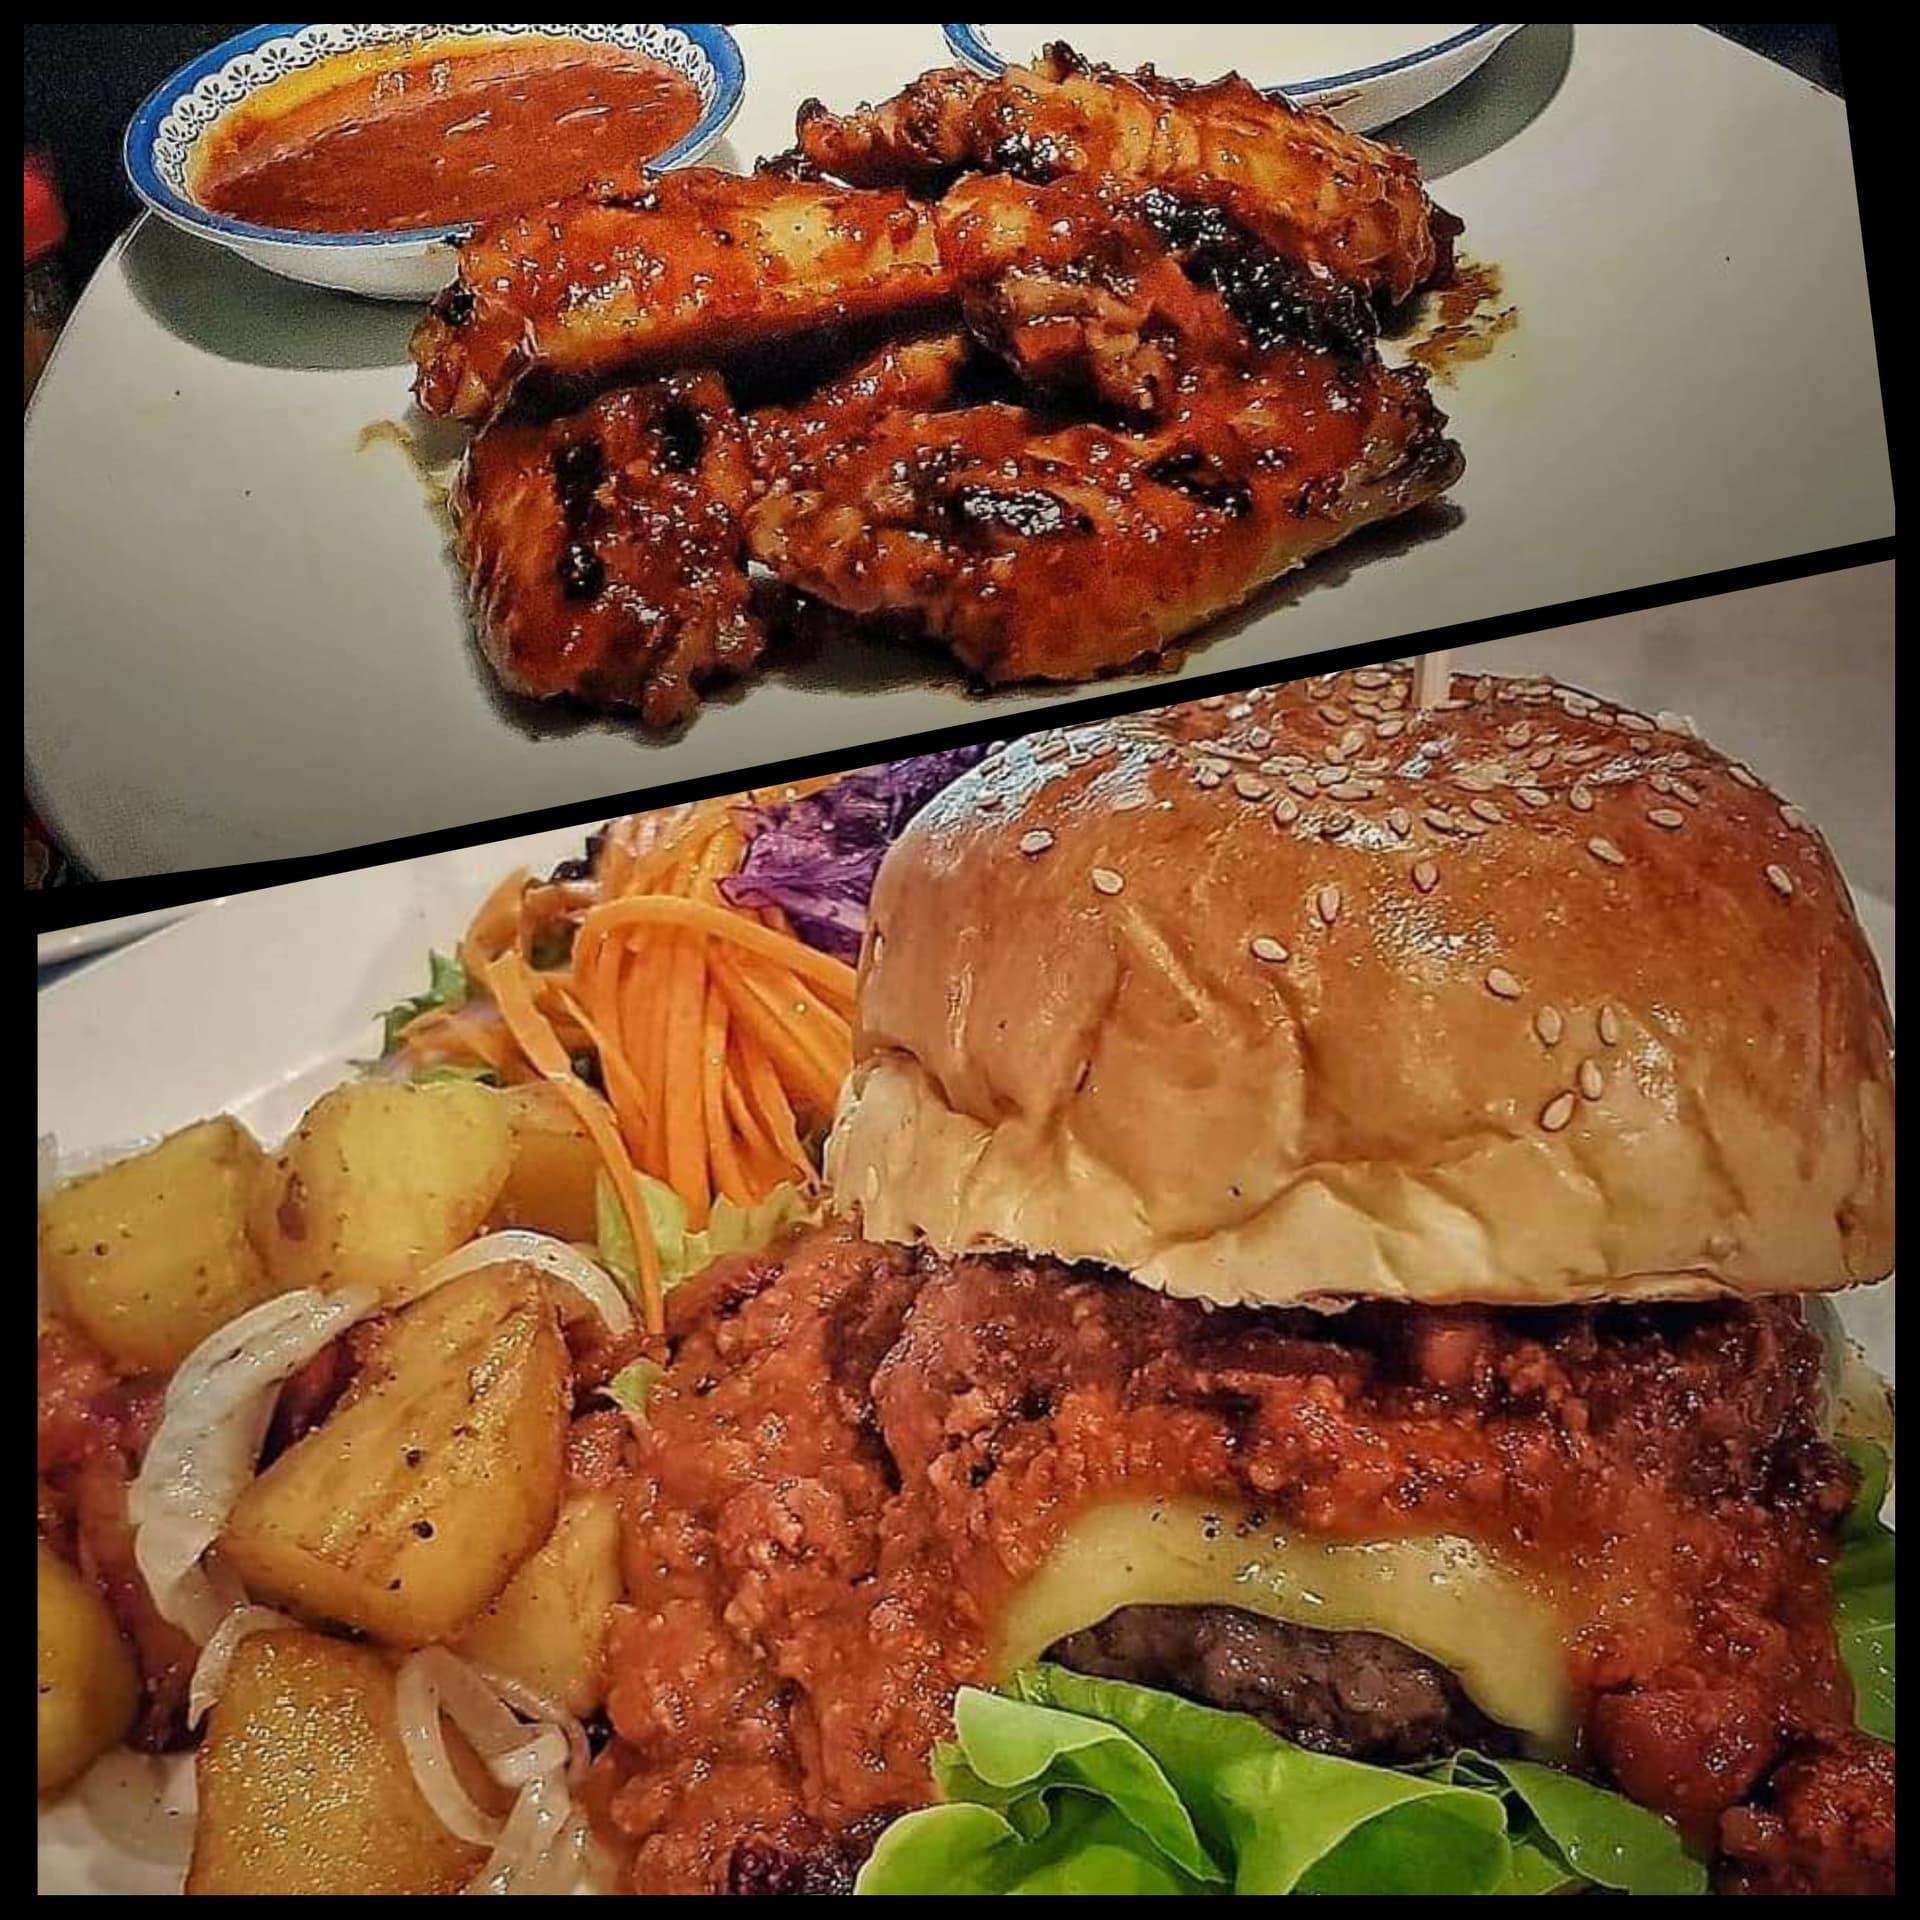 250g Chili-Cheese Burger Inc Sides & Buffalo HOT Wings Deal!